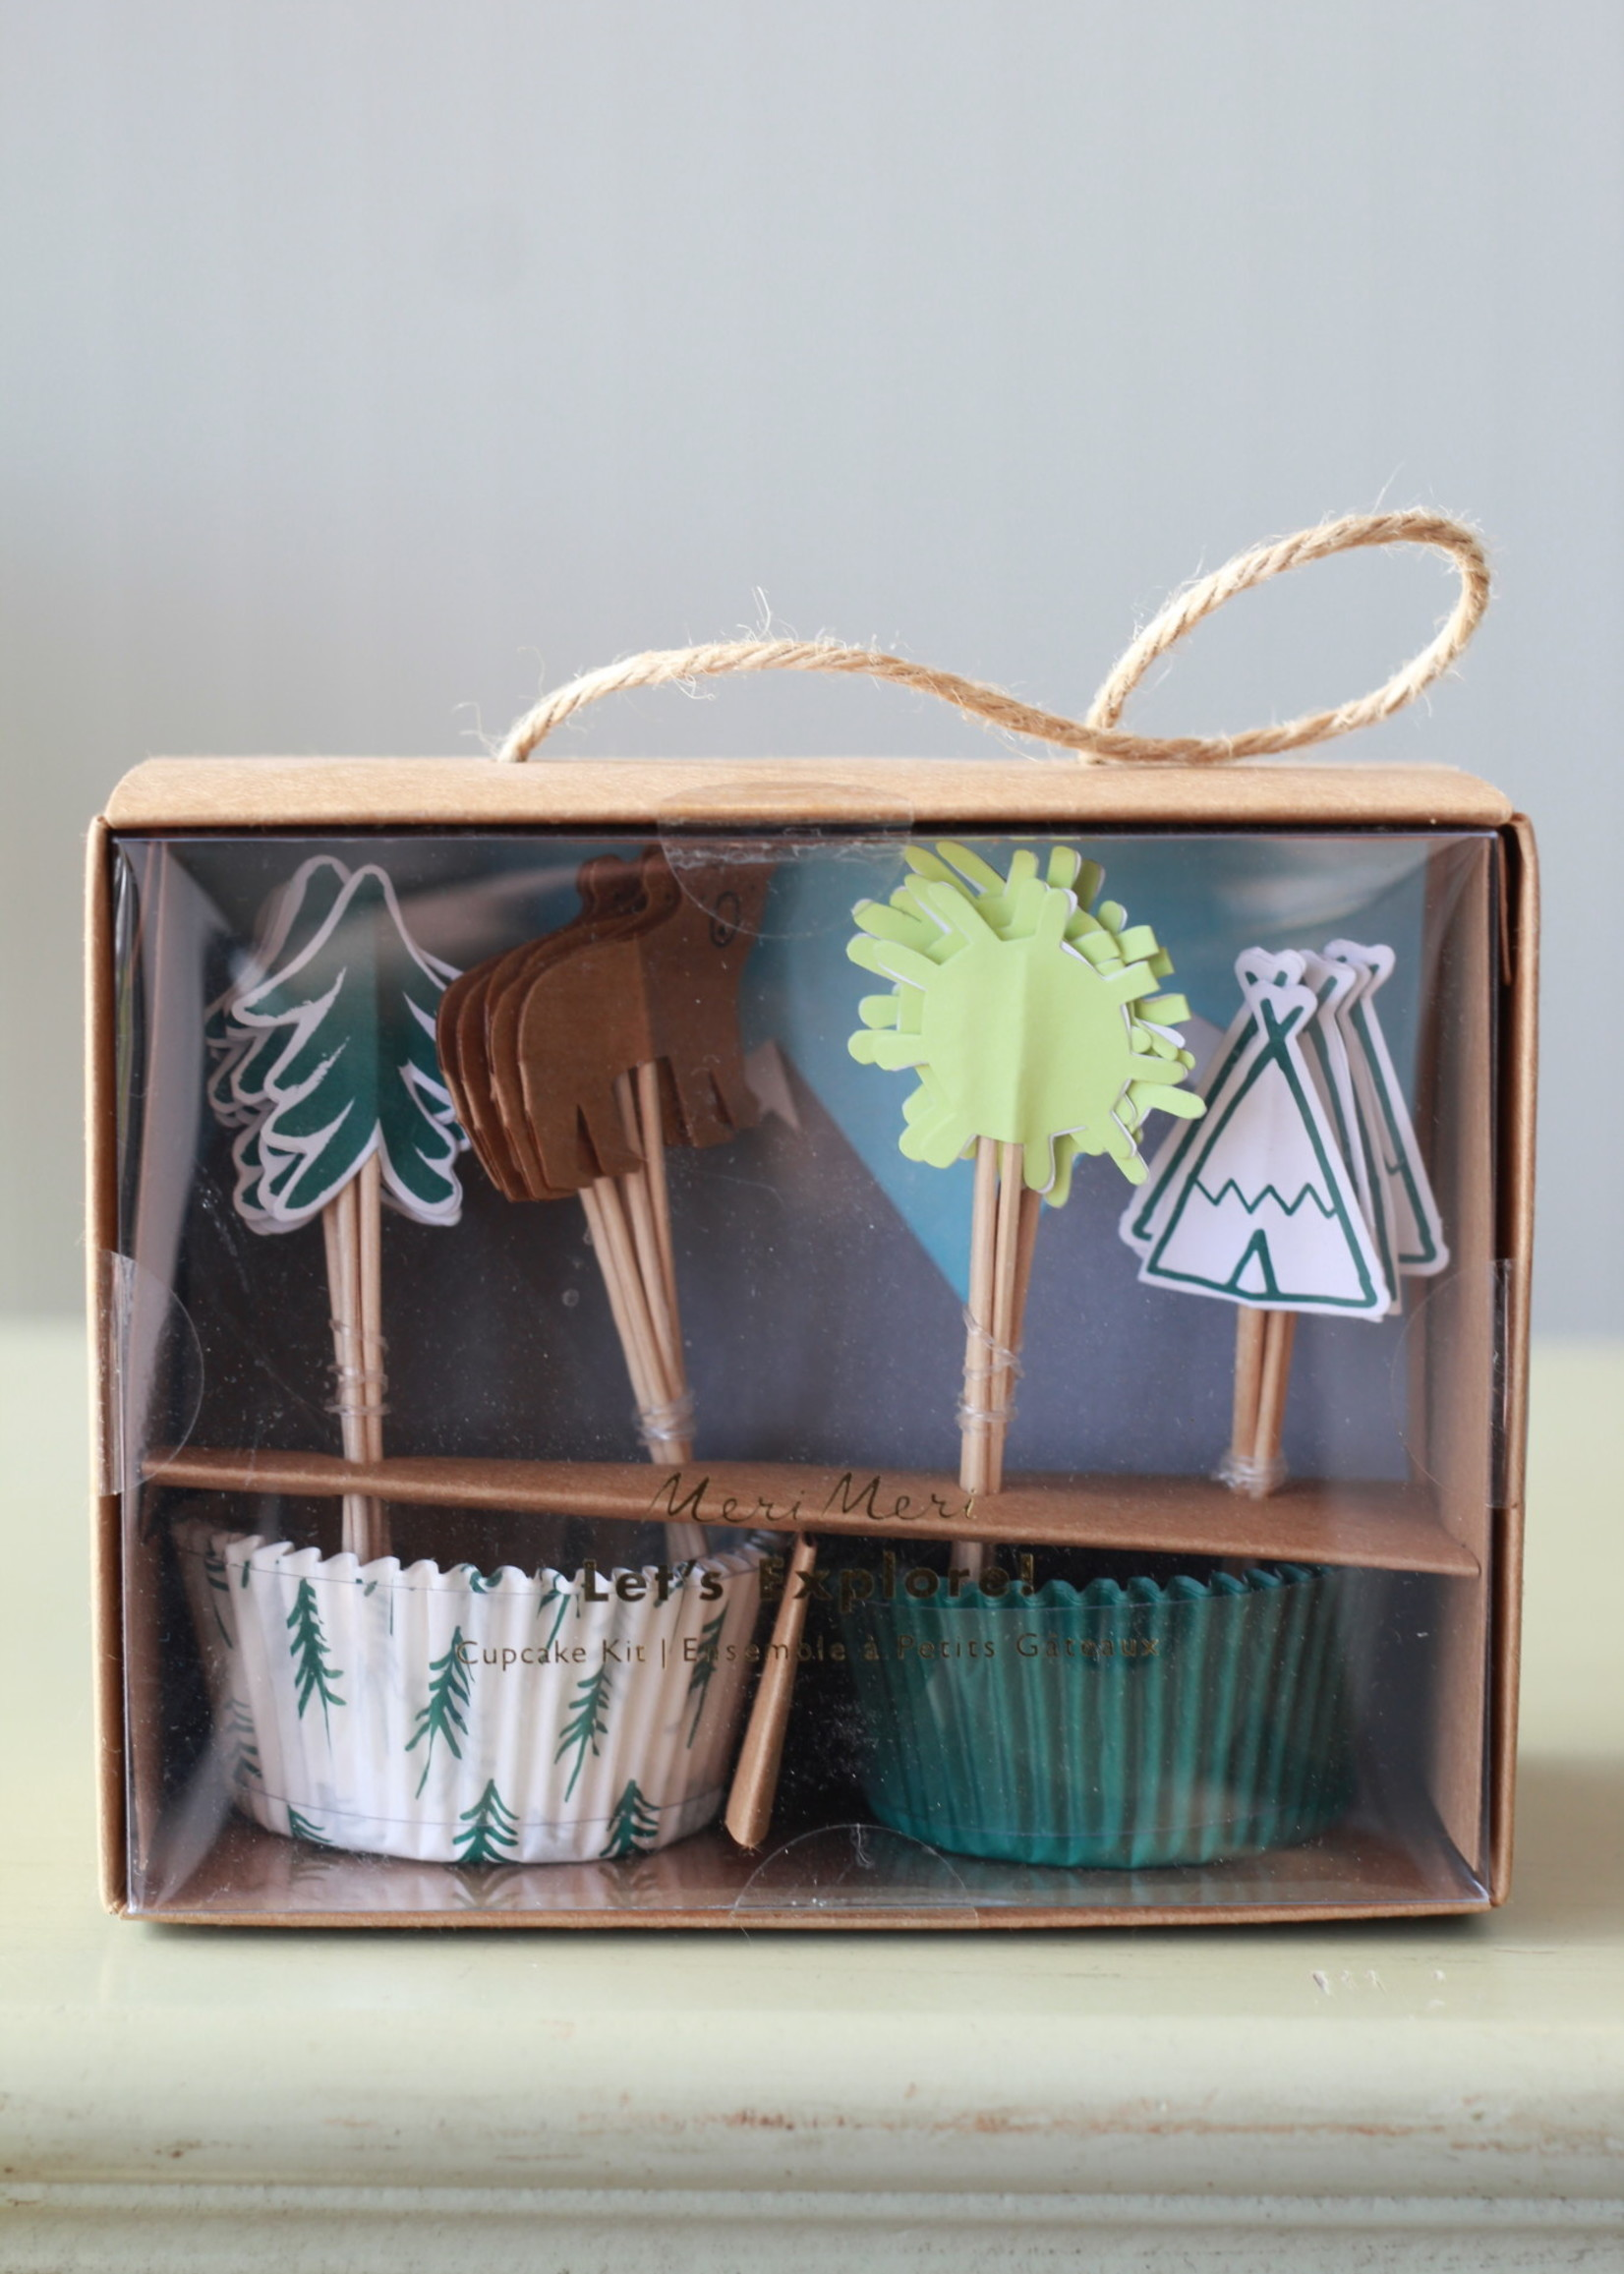 Let's Explore Cupcake Kit